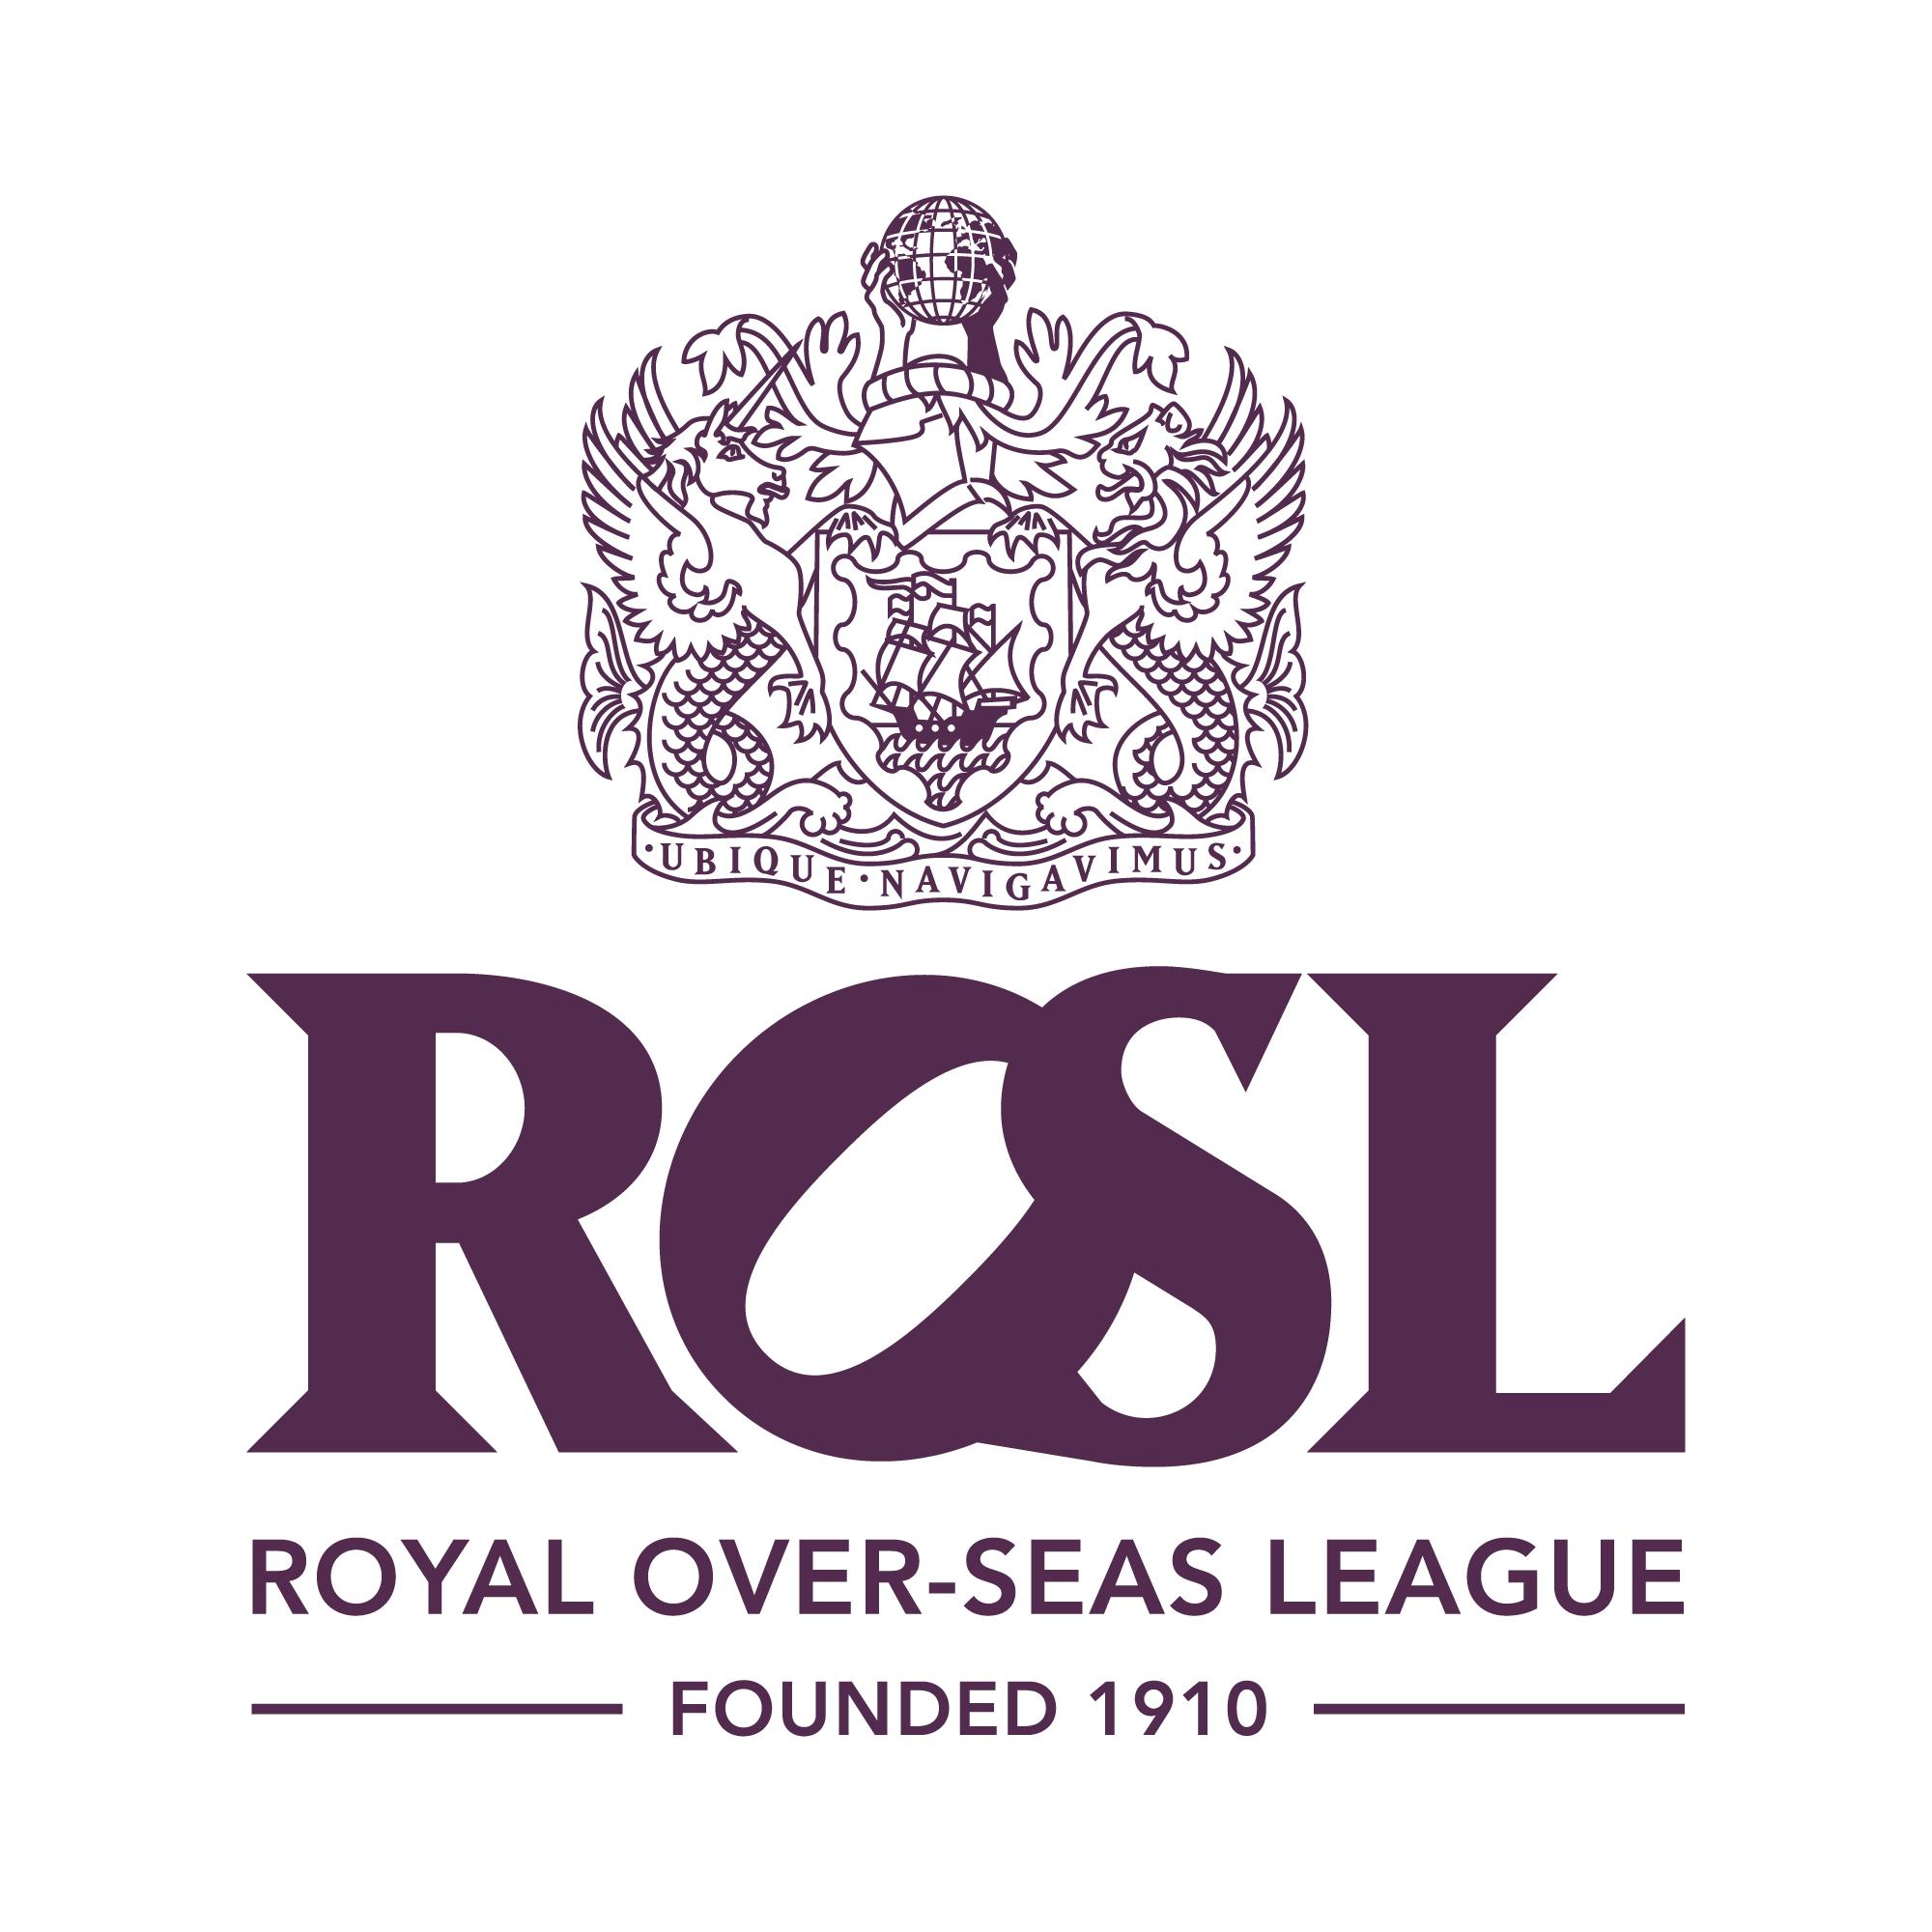 royalOverSeasLeague.jpg